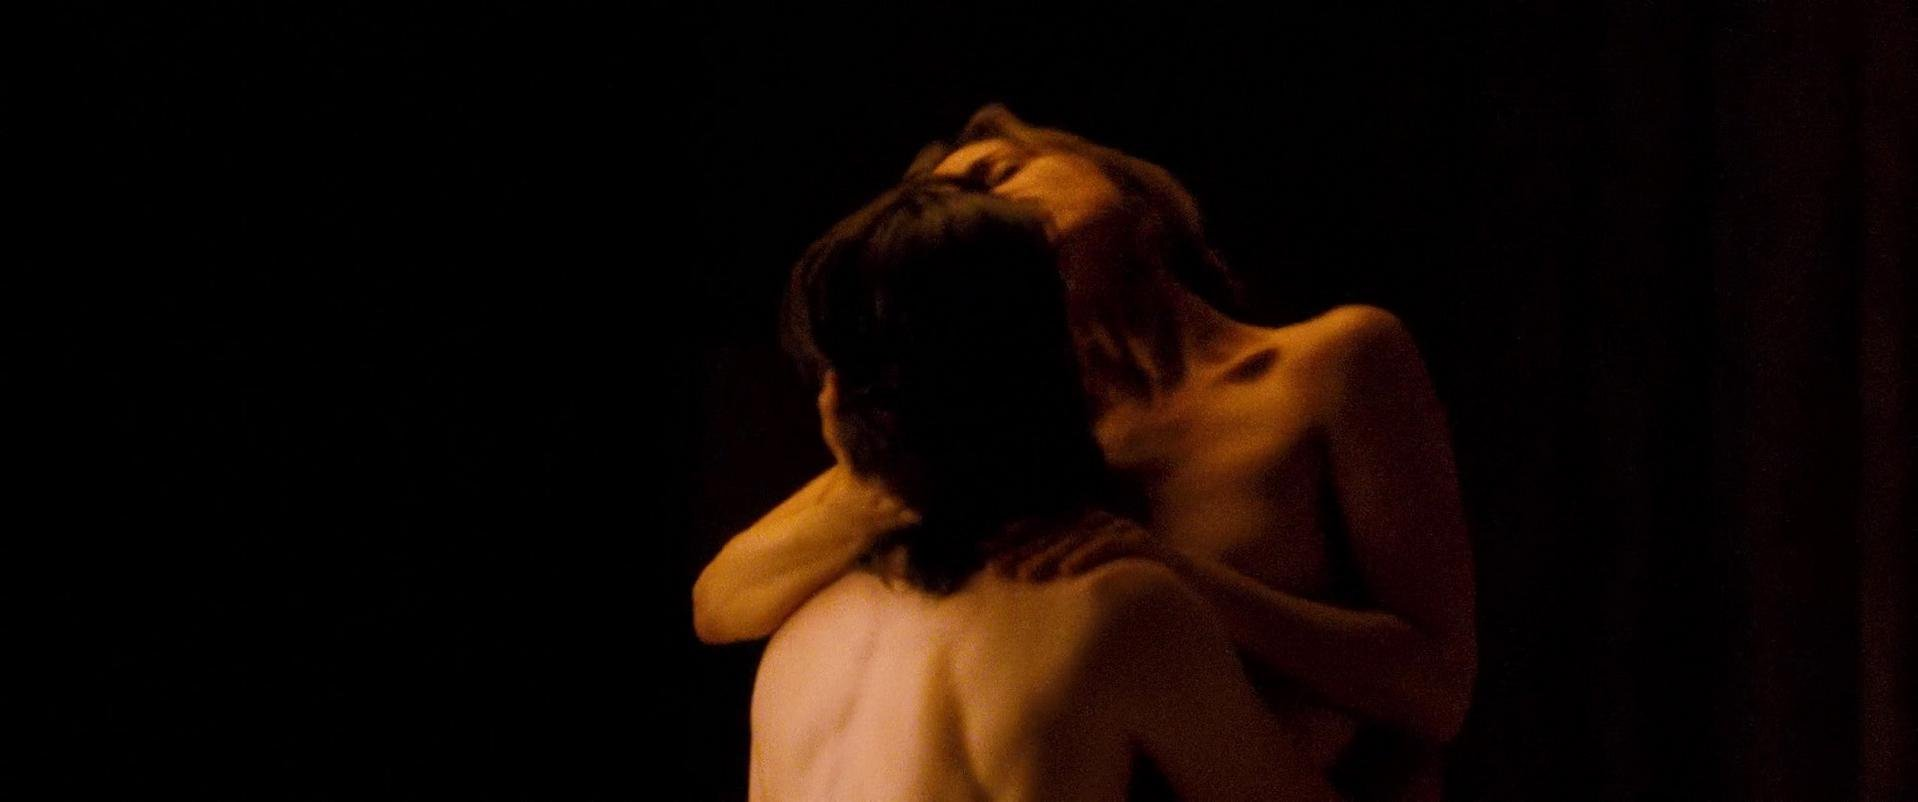 Eliza Dushku nude - Locked In (2010)